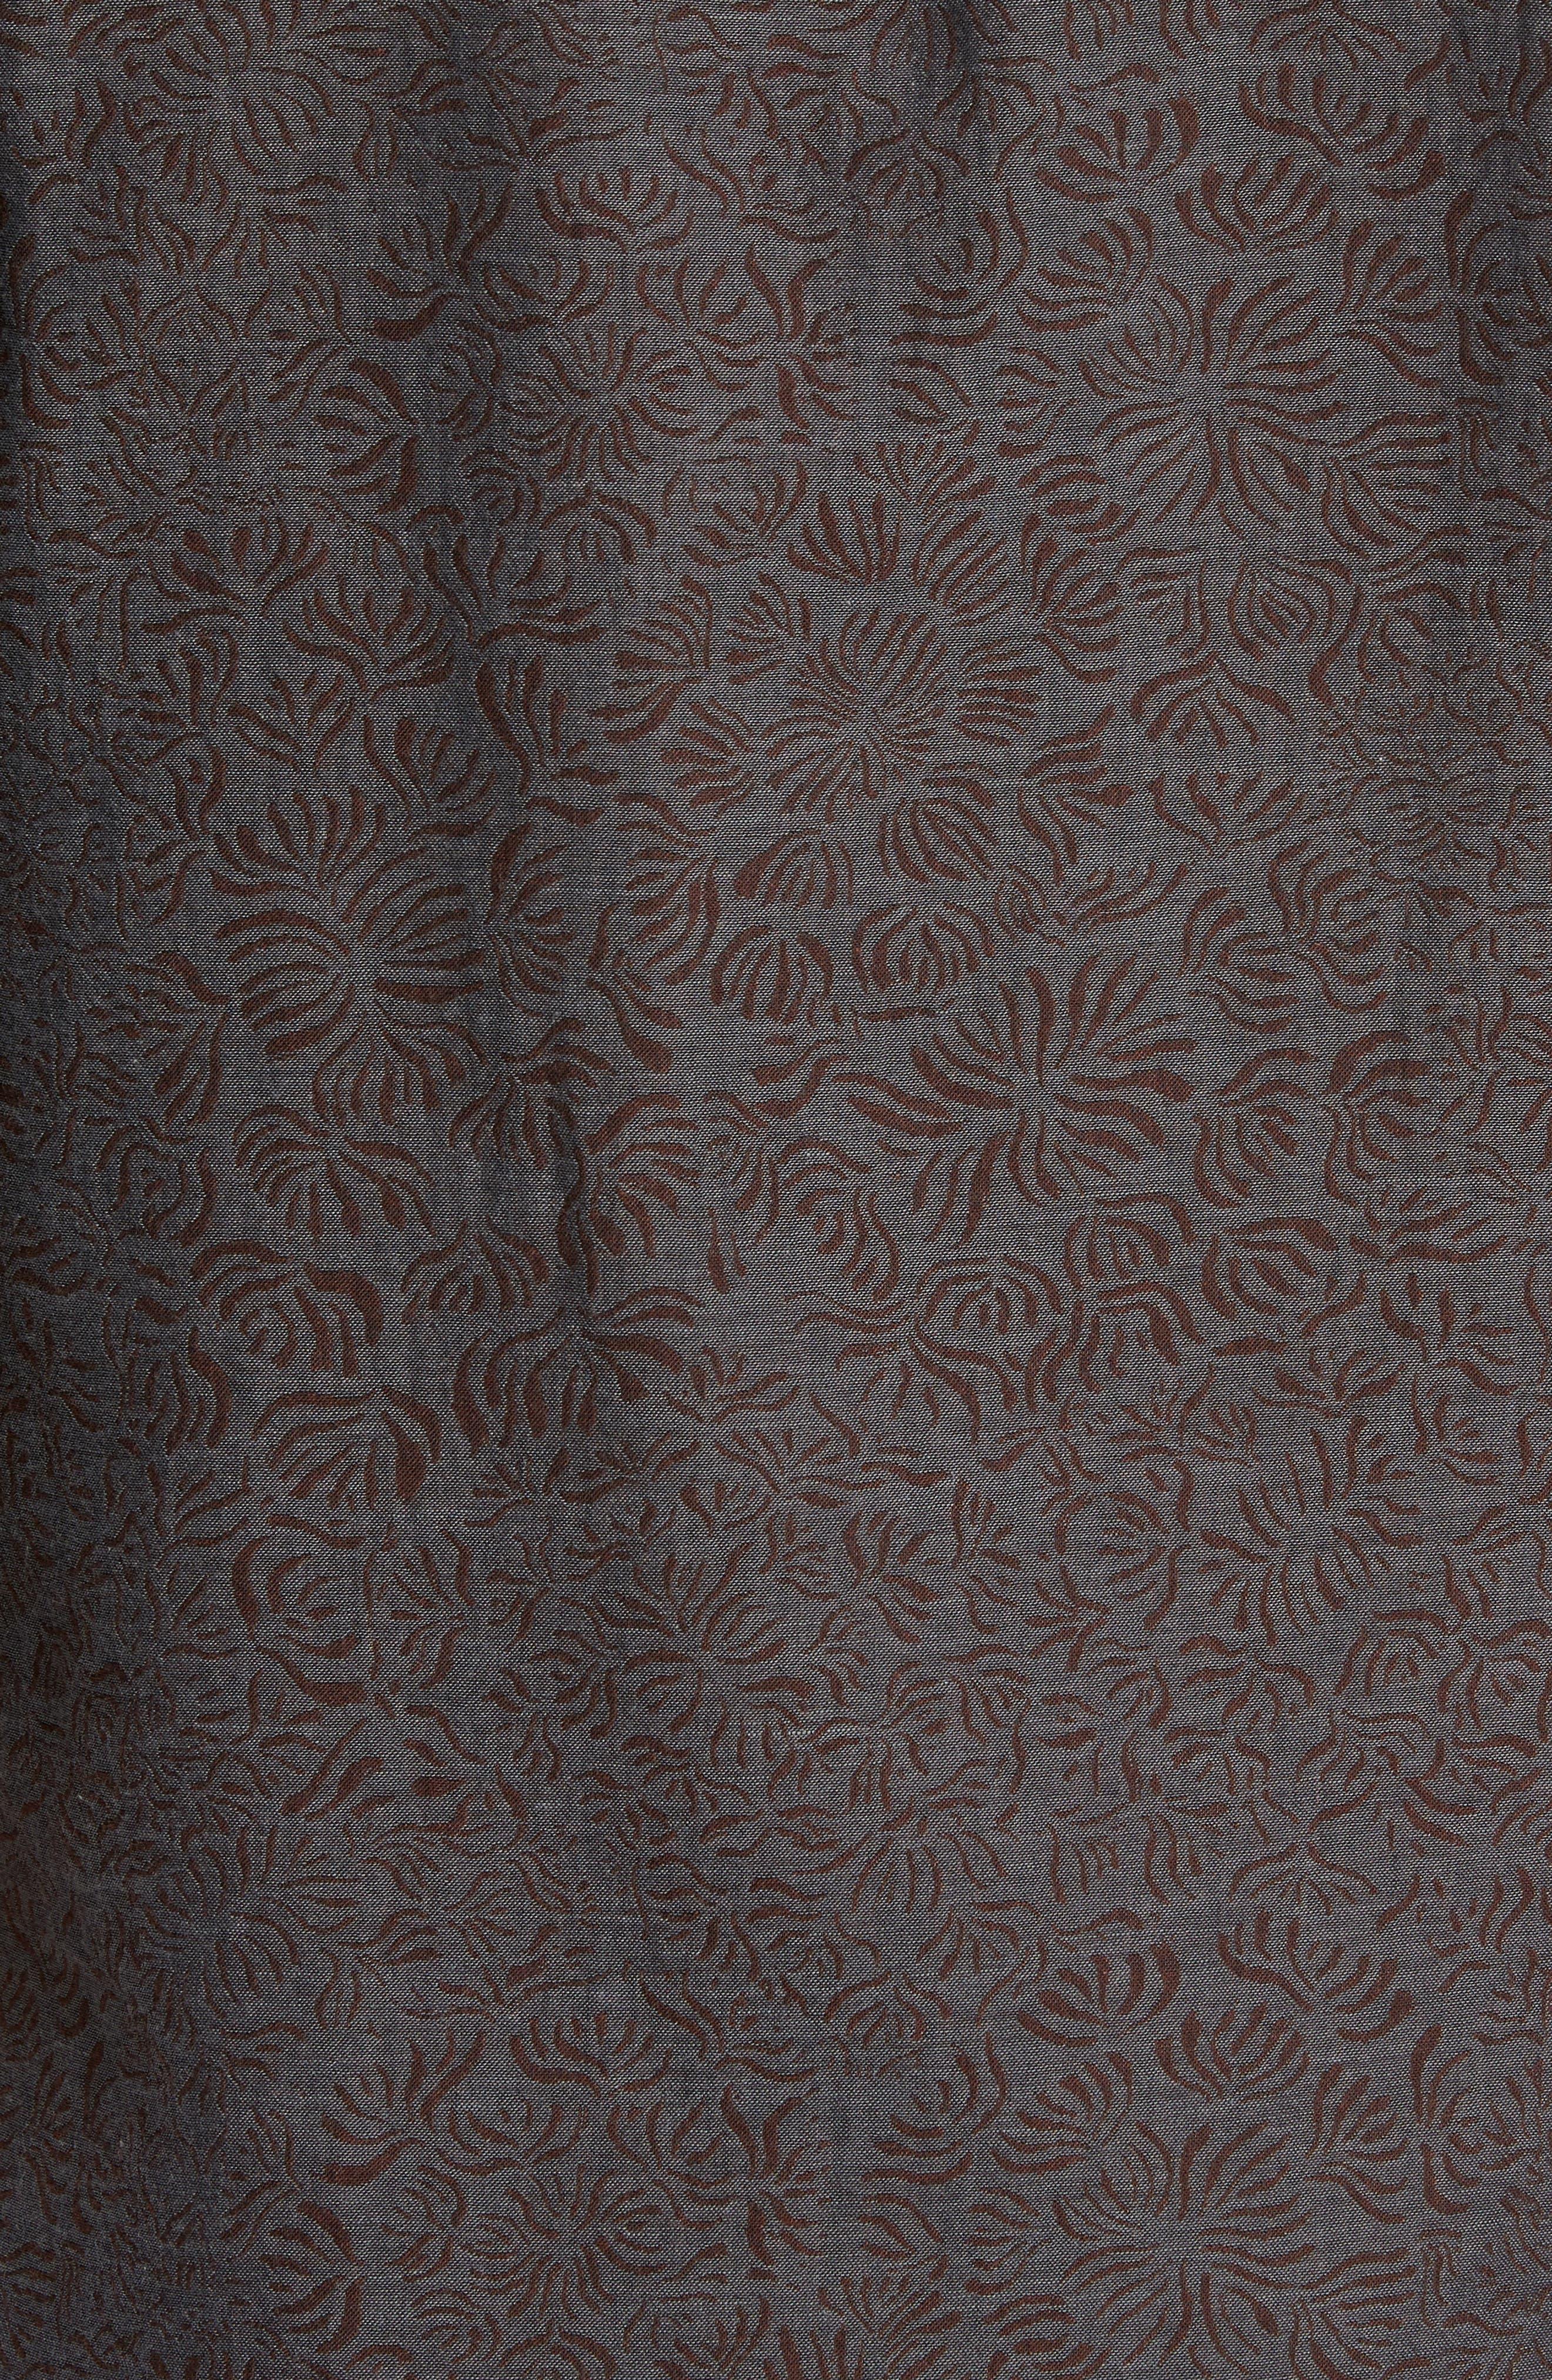 Kirby Slim Fit Jacquard Sport Shirt,                             Alternate thumbnail 5, color,                             Charcoal/ Burgundy